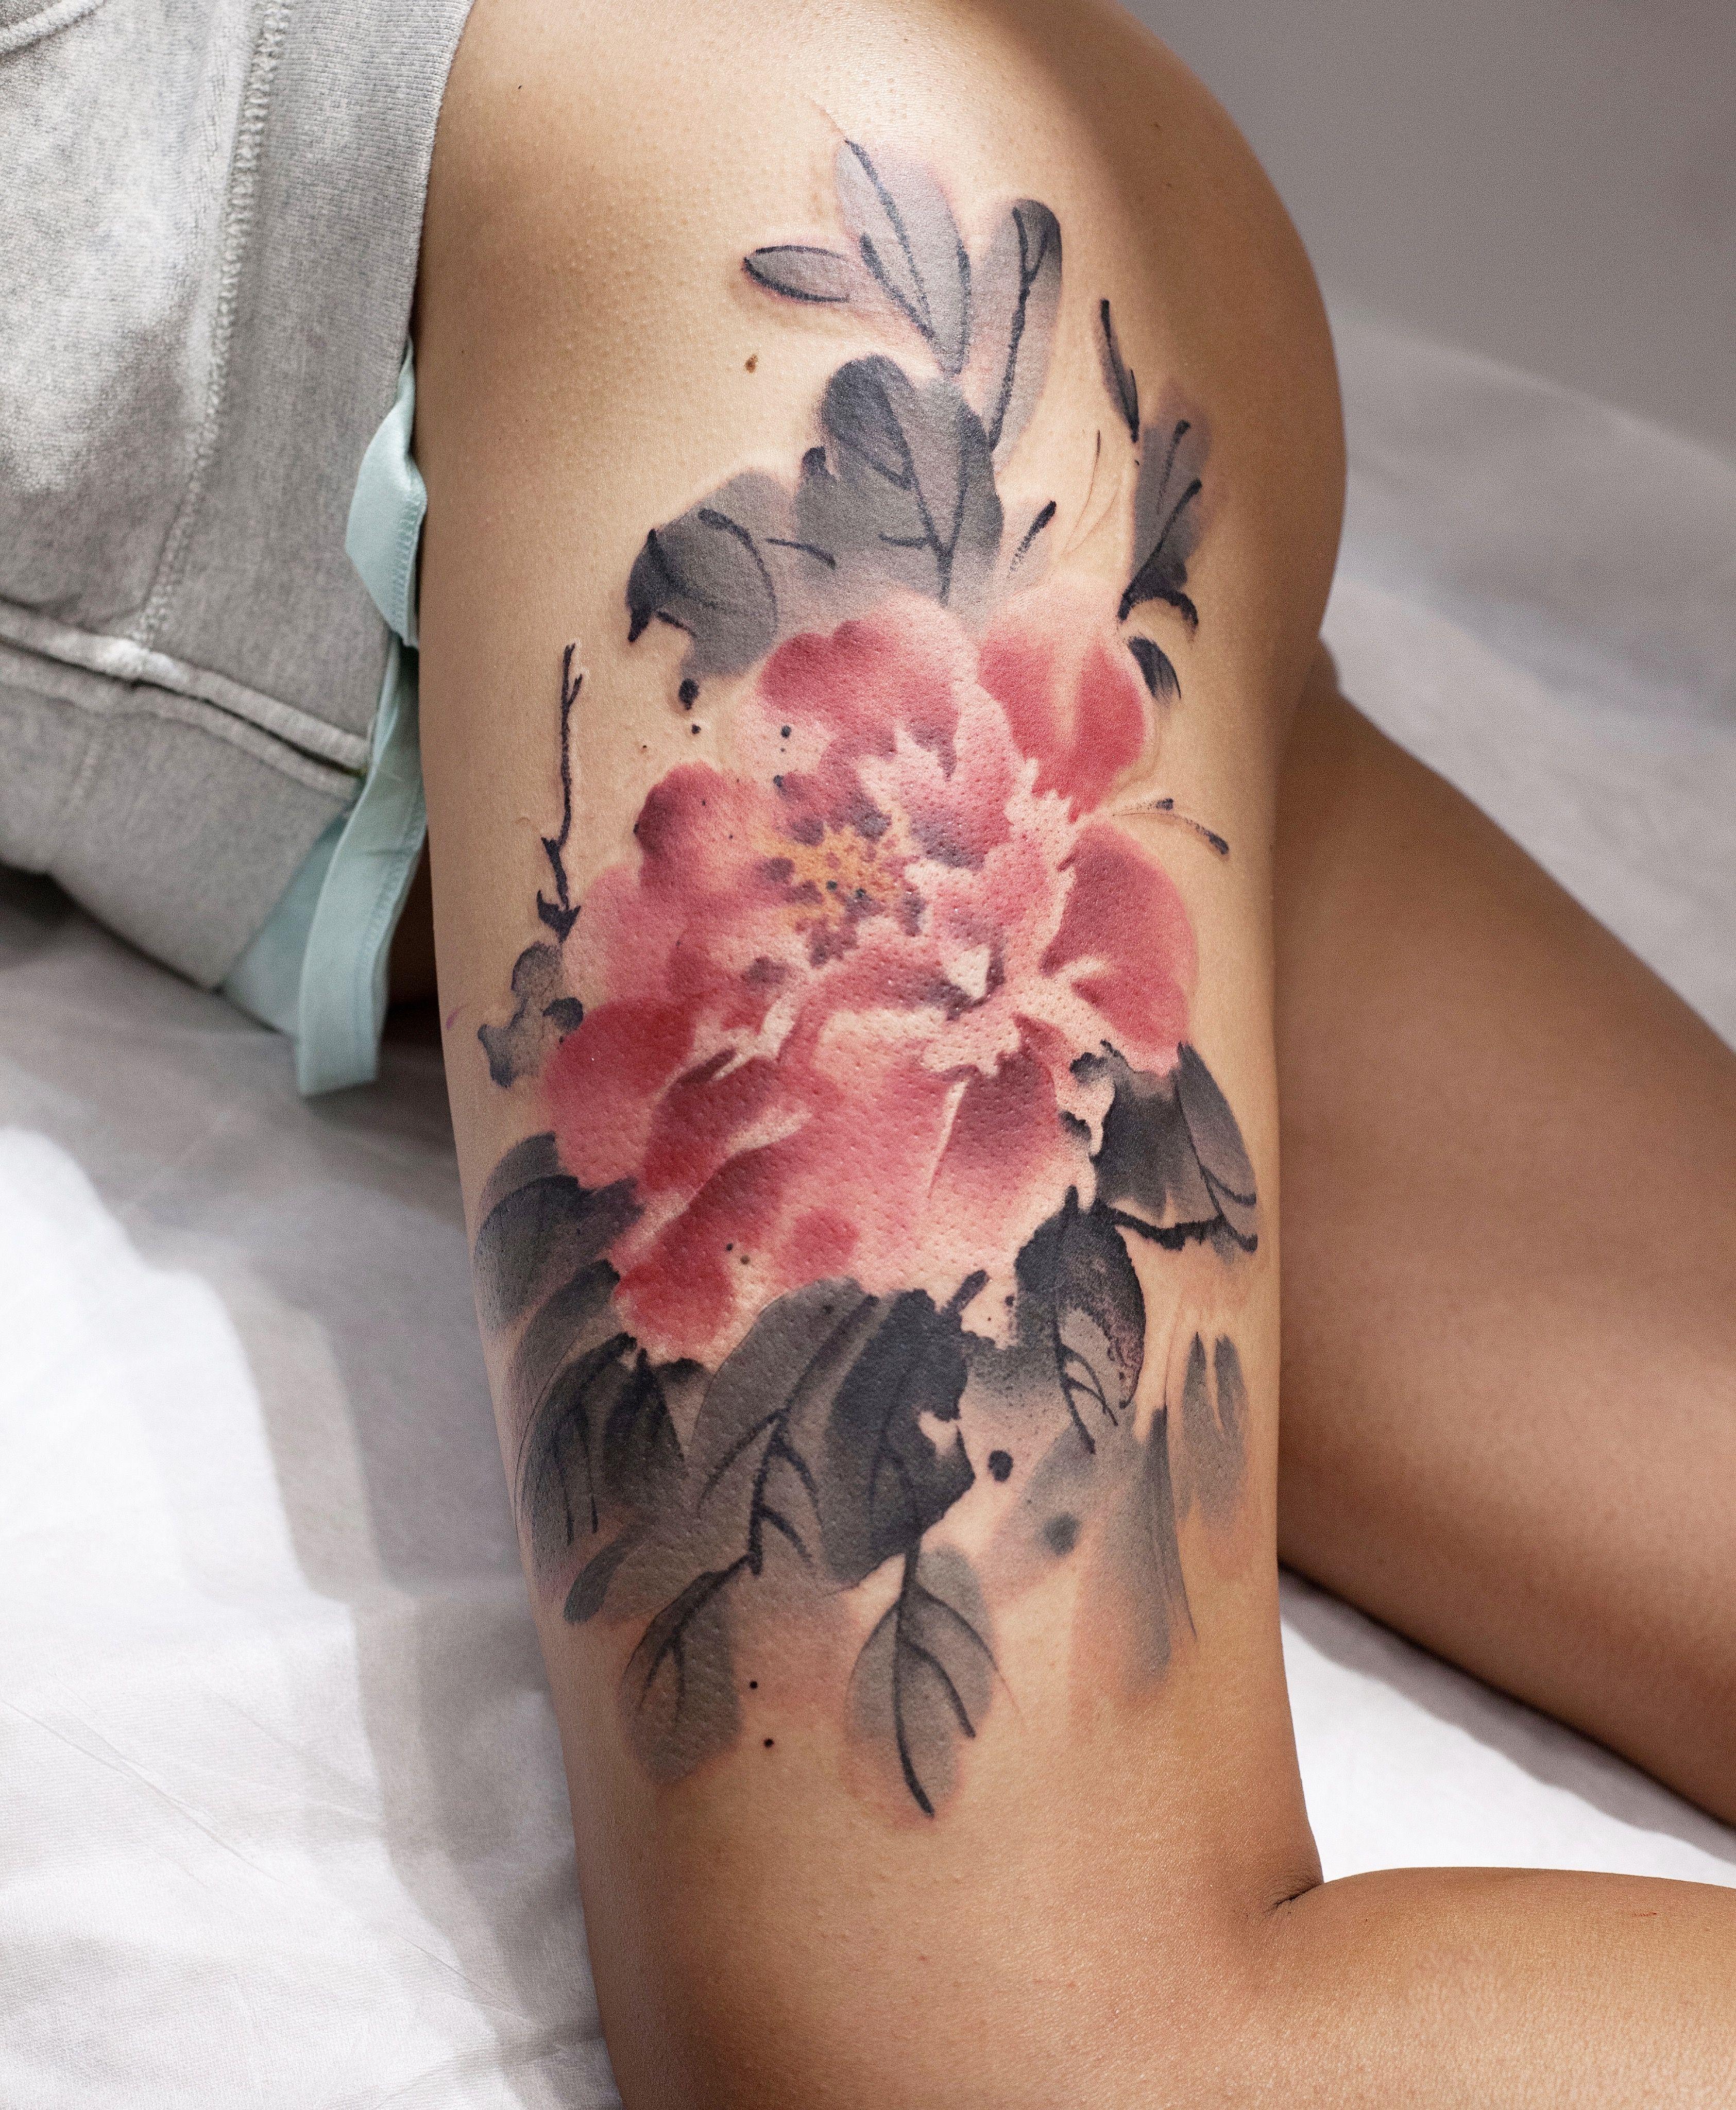 watercolor tattoo flower - 736×894